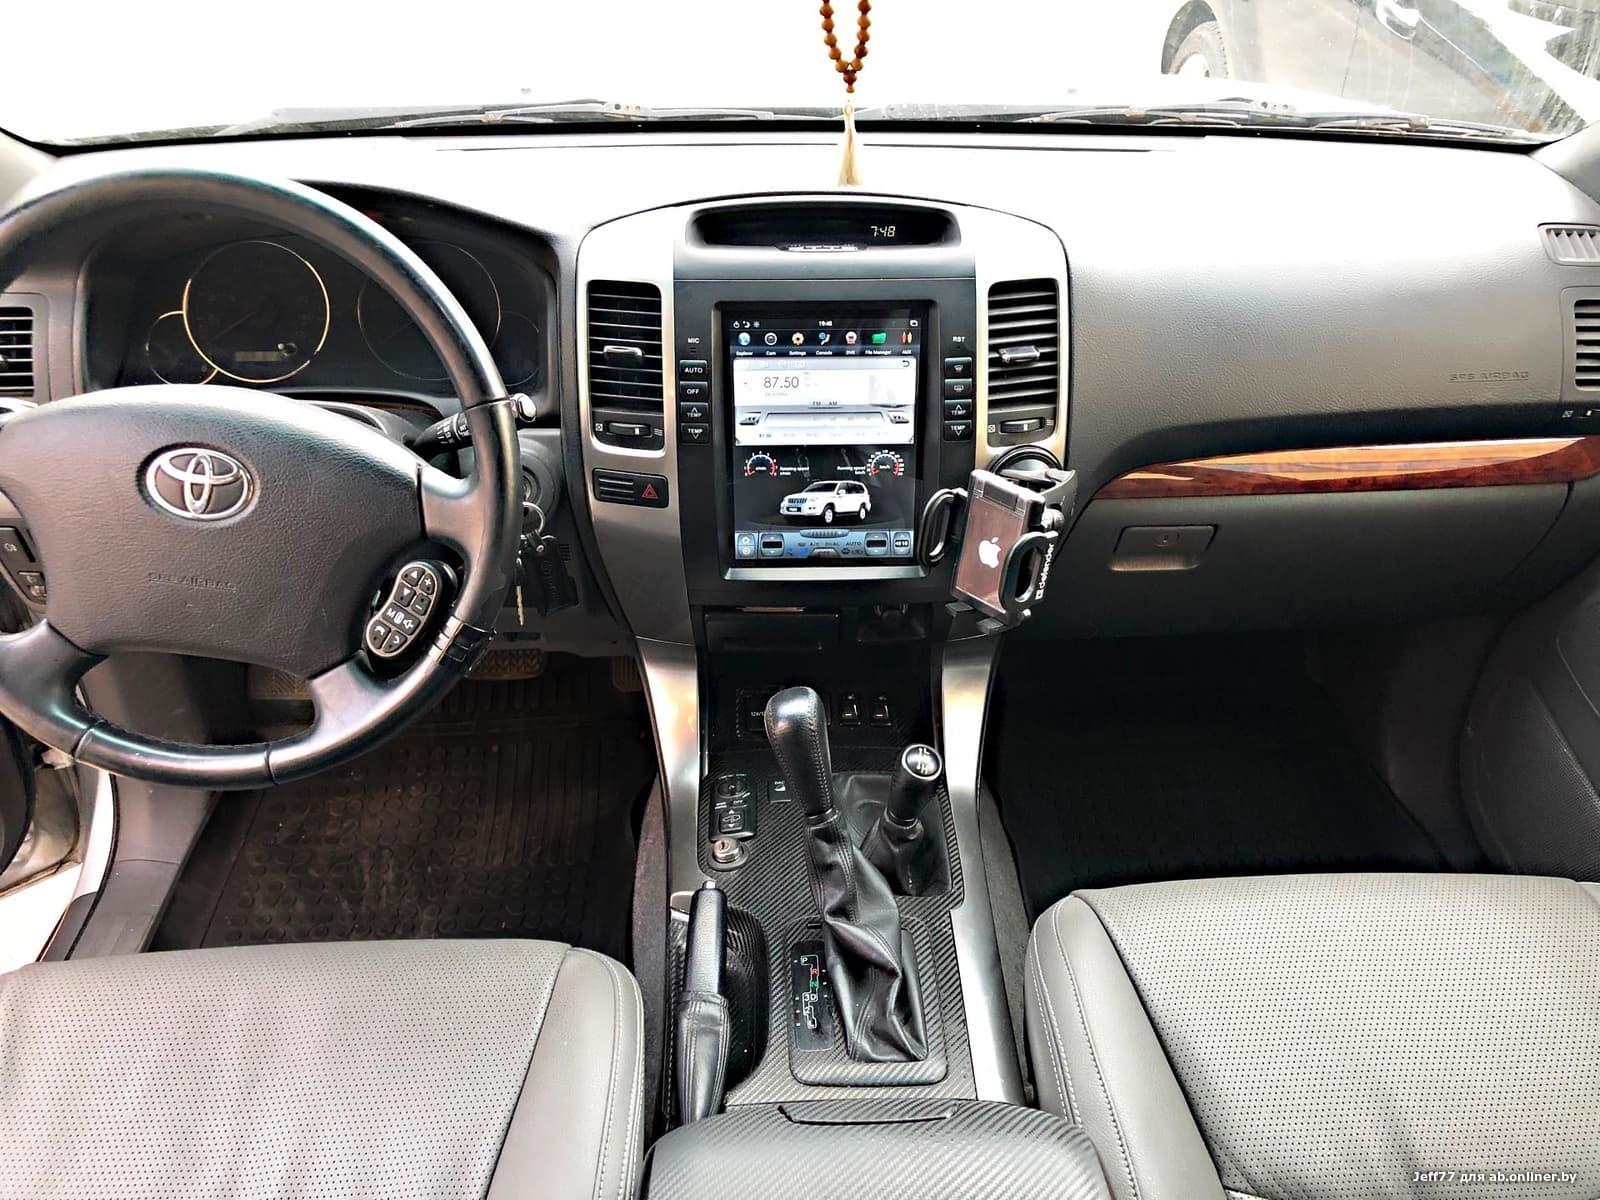 Toyota Land Cruiser Prado 120